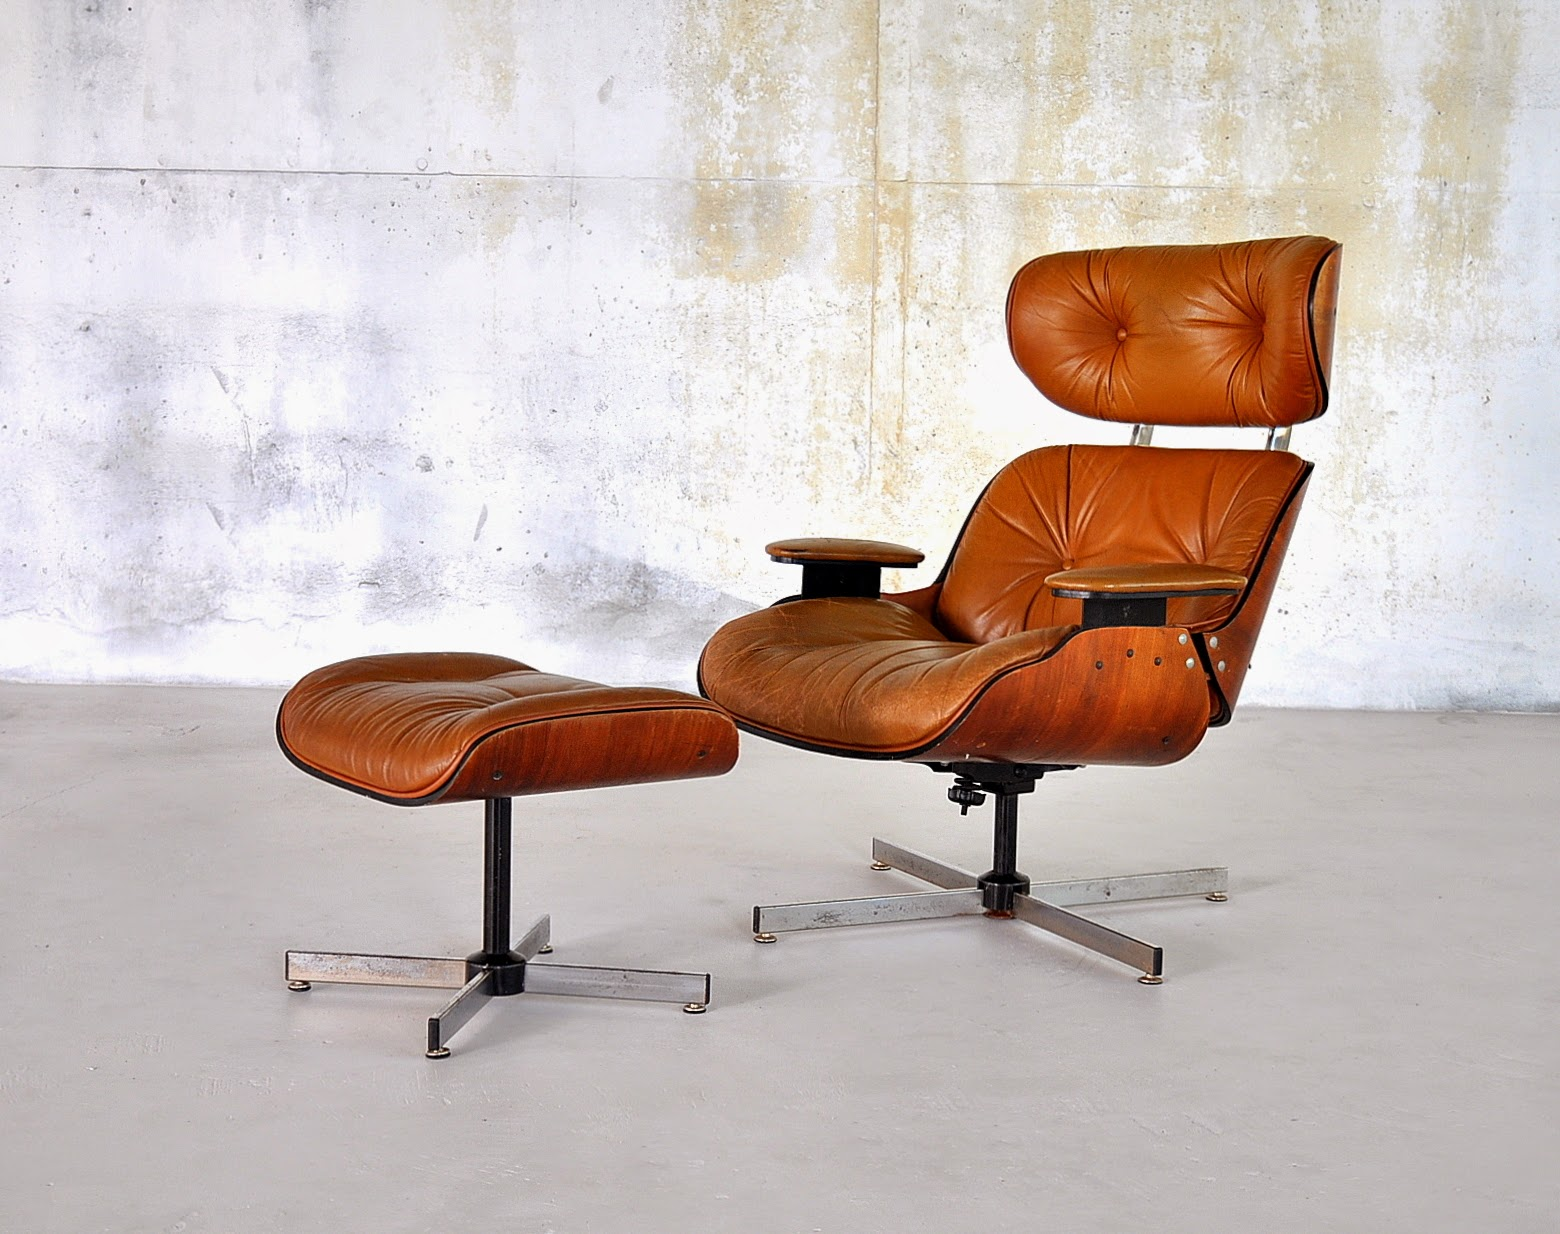 Selig Eames Chair Veranda Swing Select Modern: Leather Lounge & Ottoman